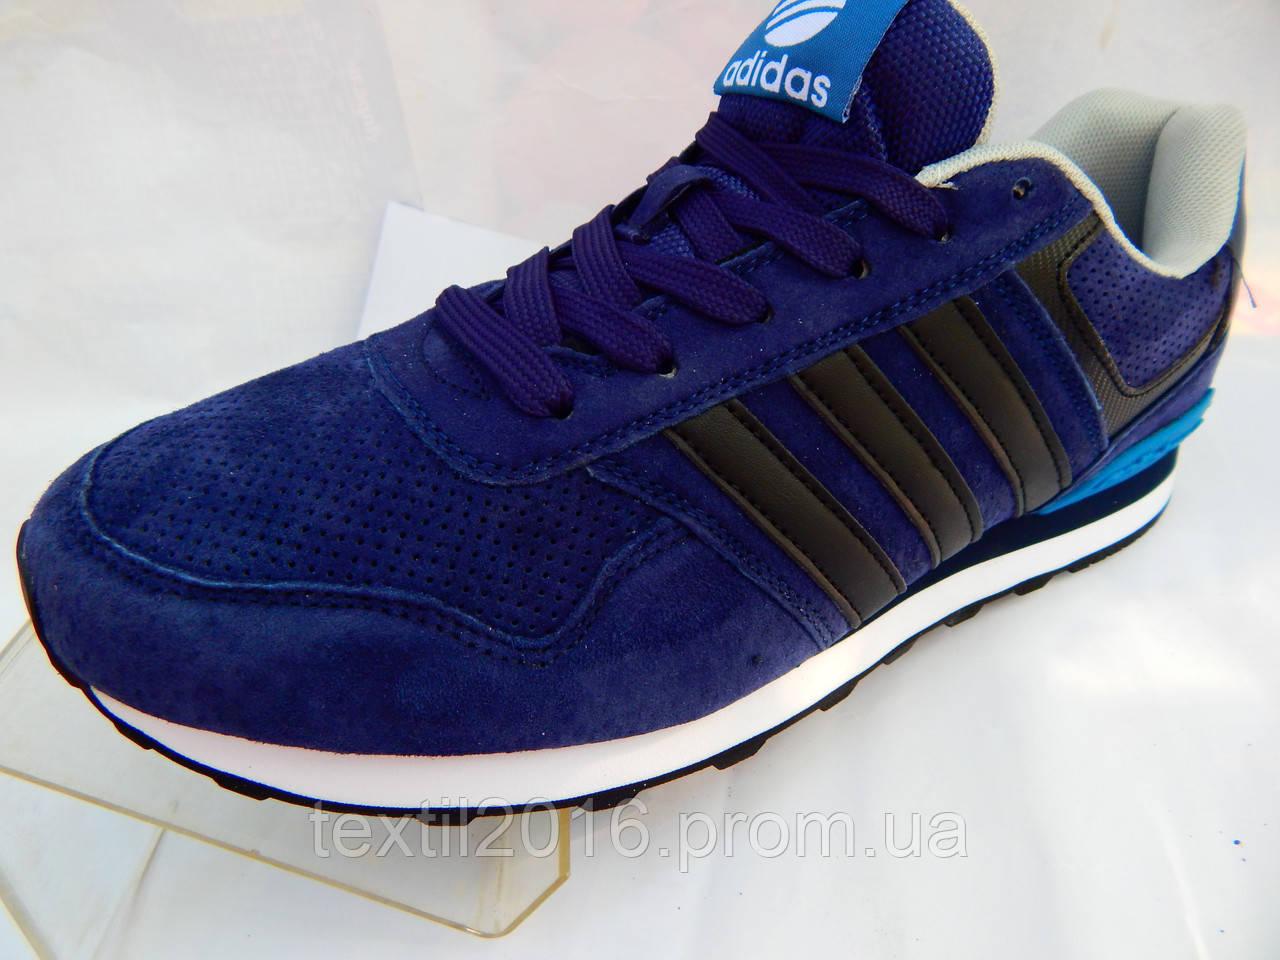 6e622677e Красивые мужские кроссовки Adidas Neo реплика - Интернет магазин